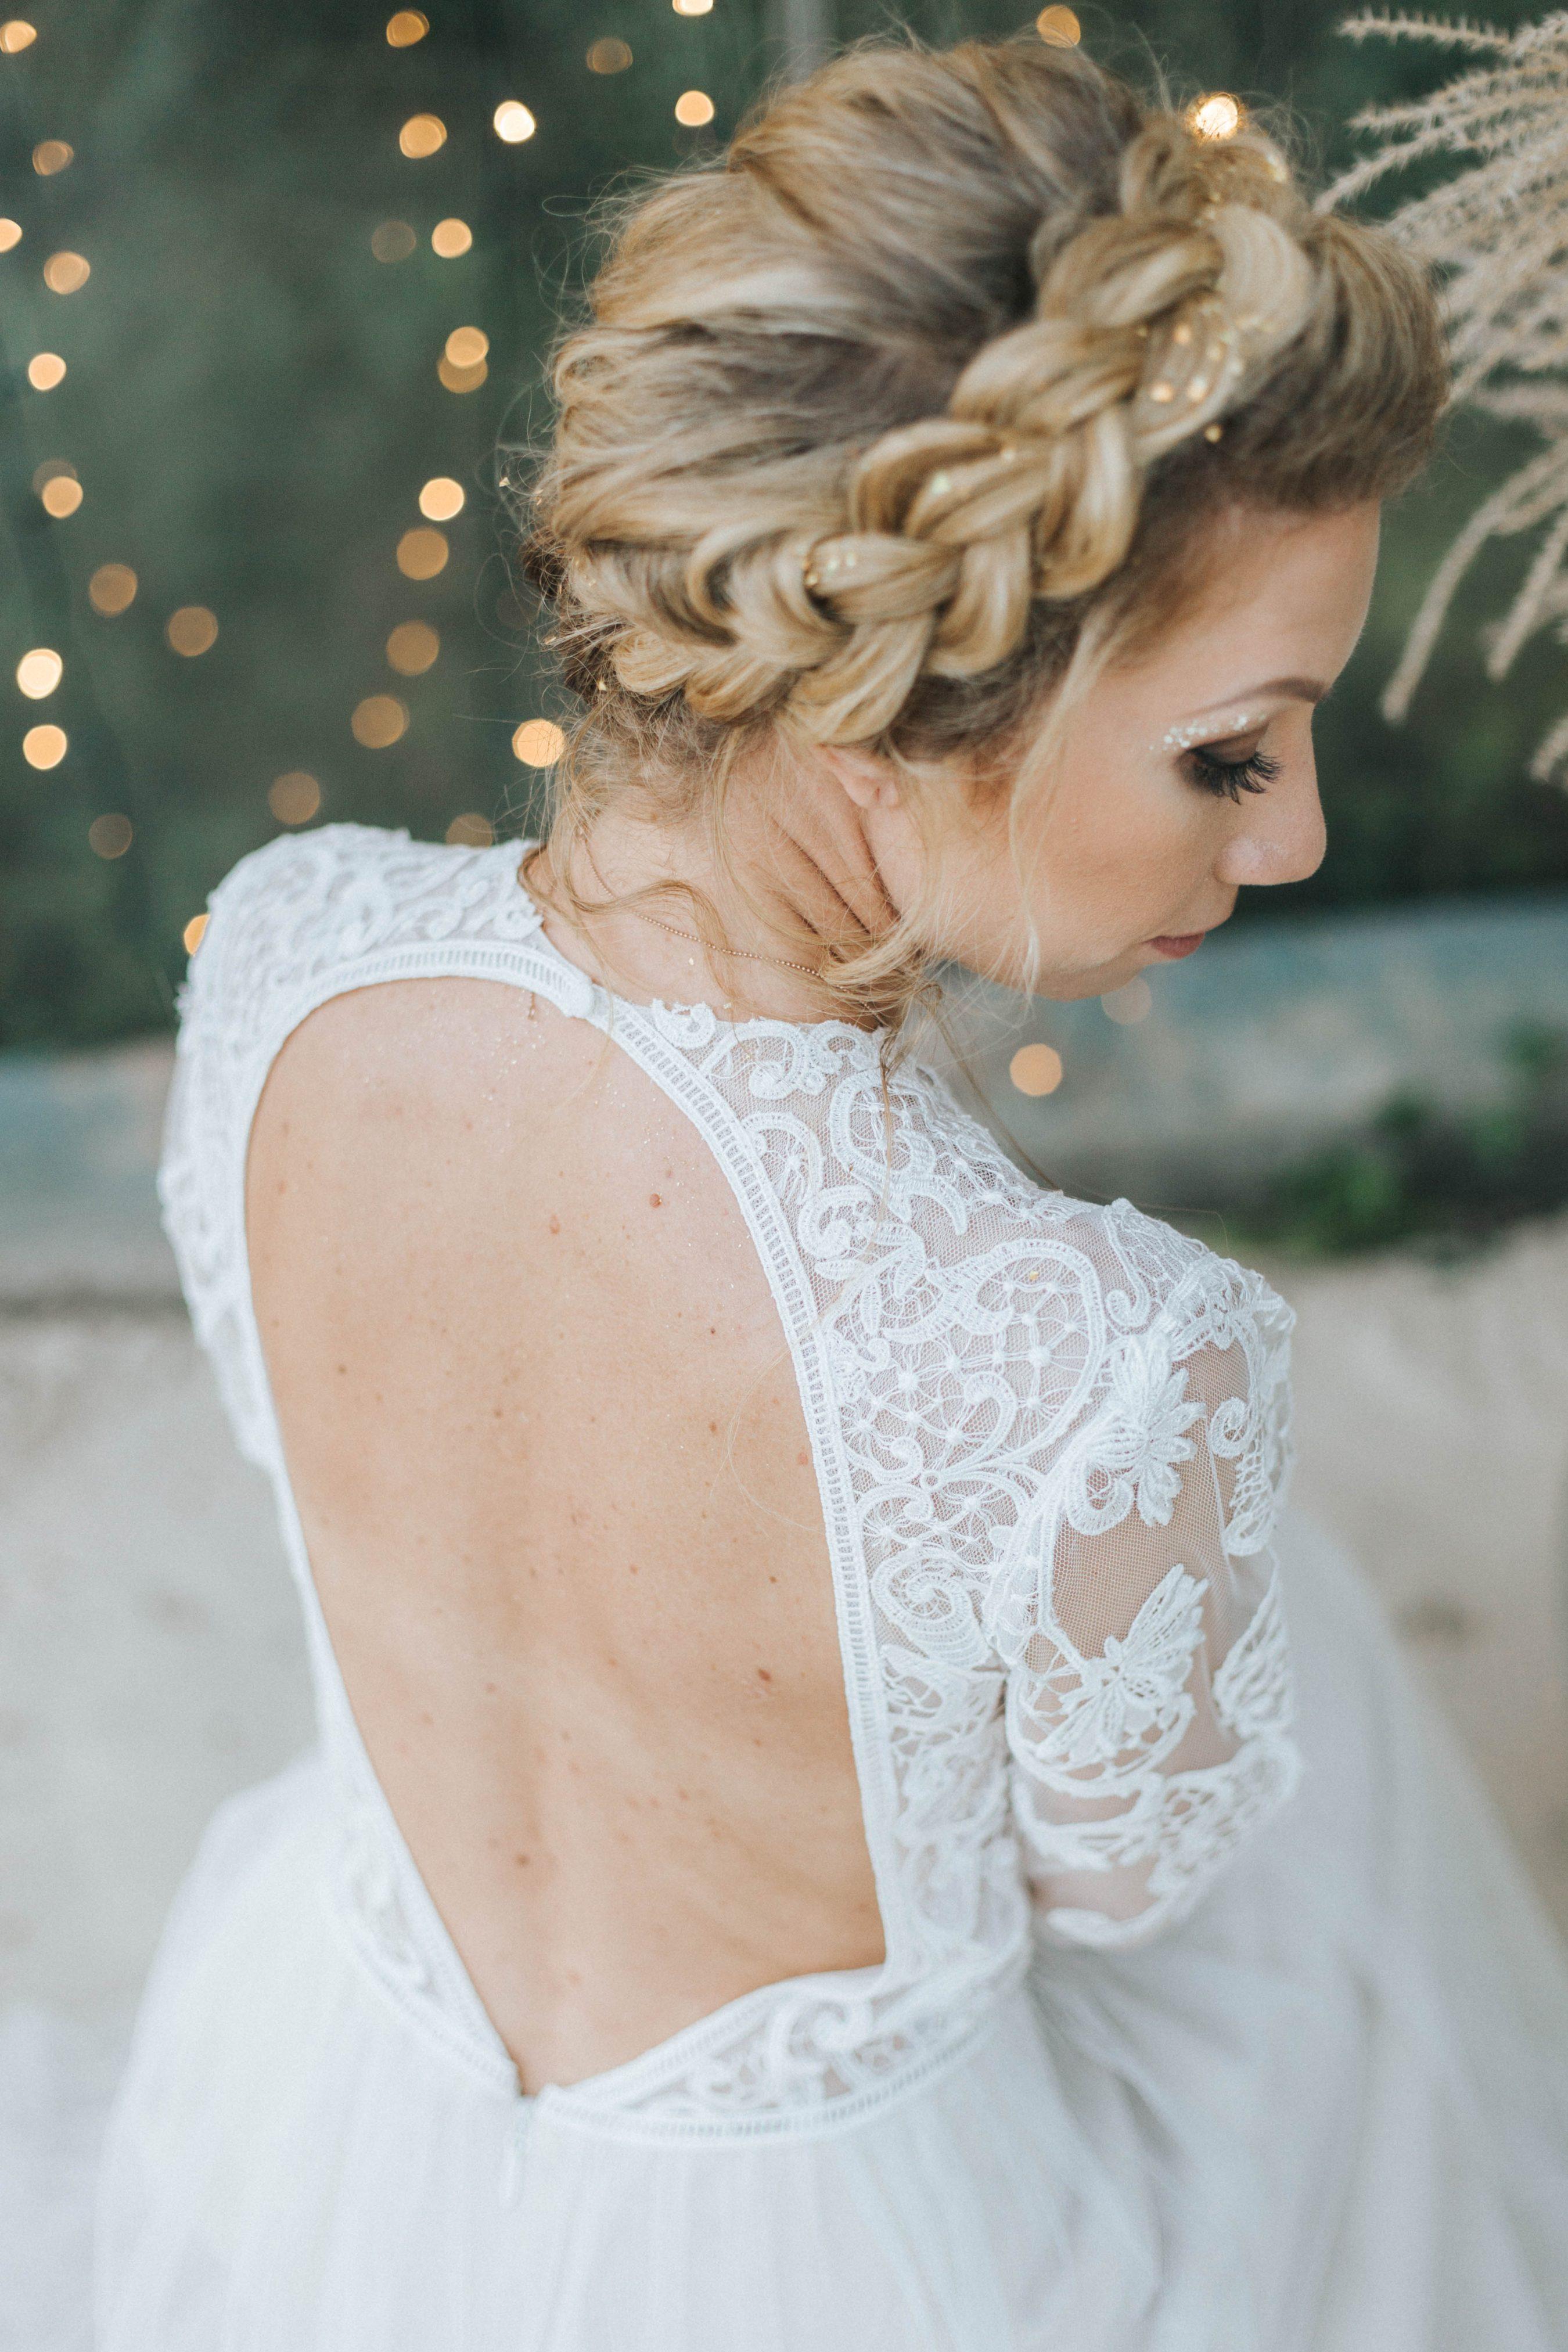 Brautfrisur hochgesteckt Zopf